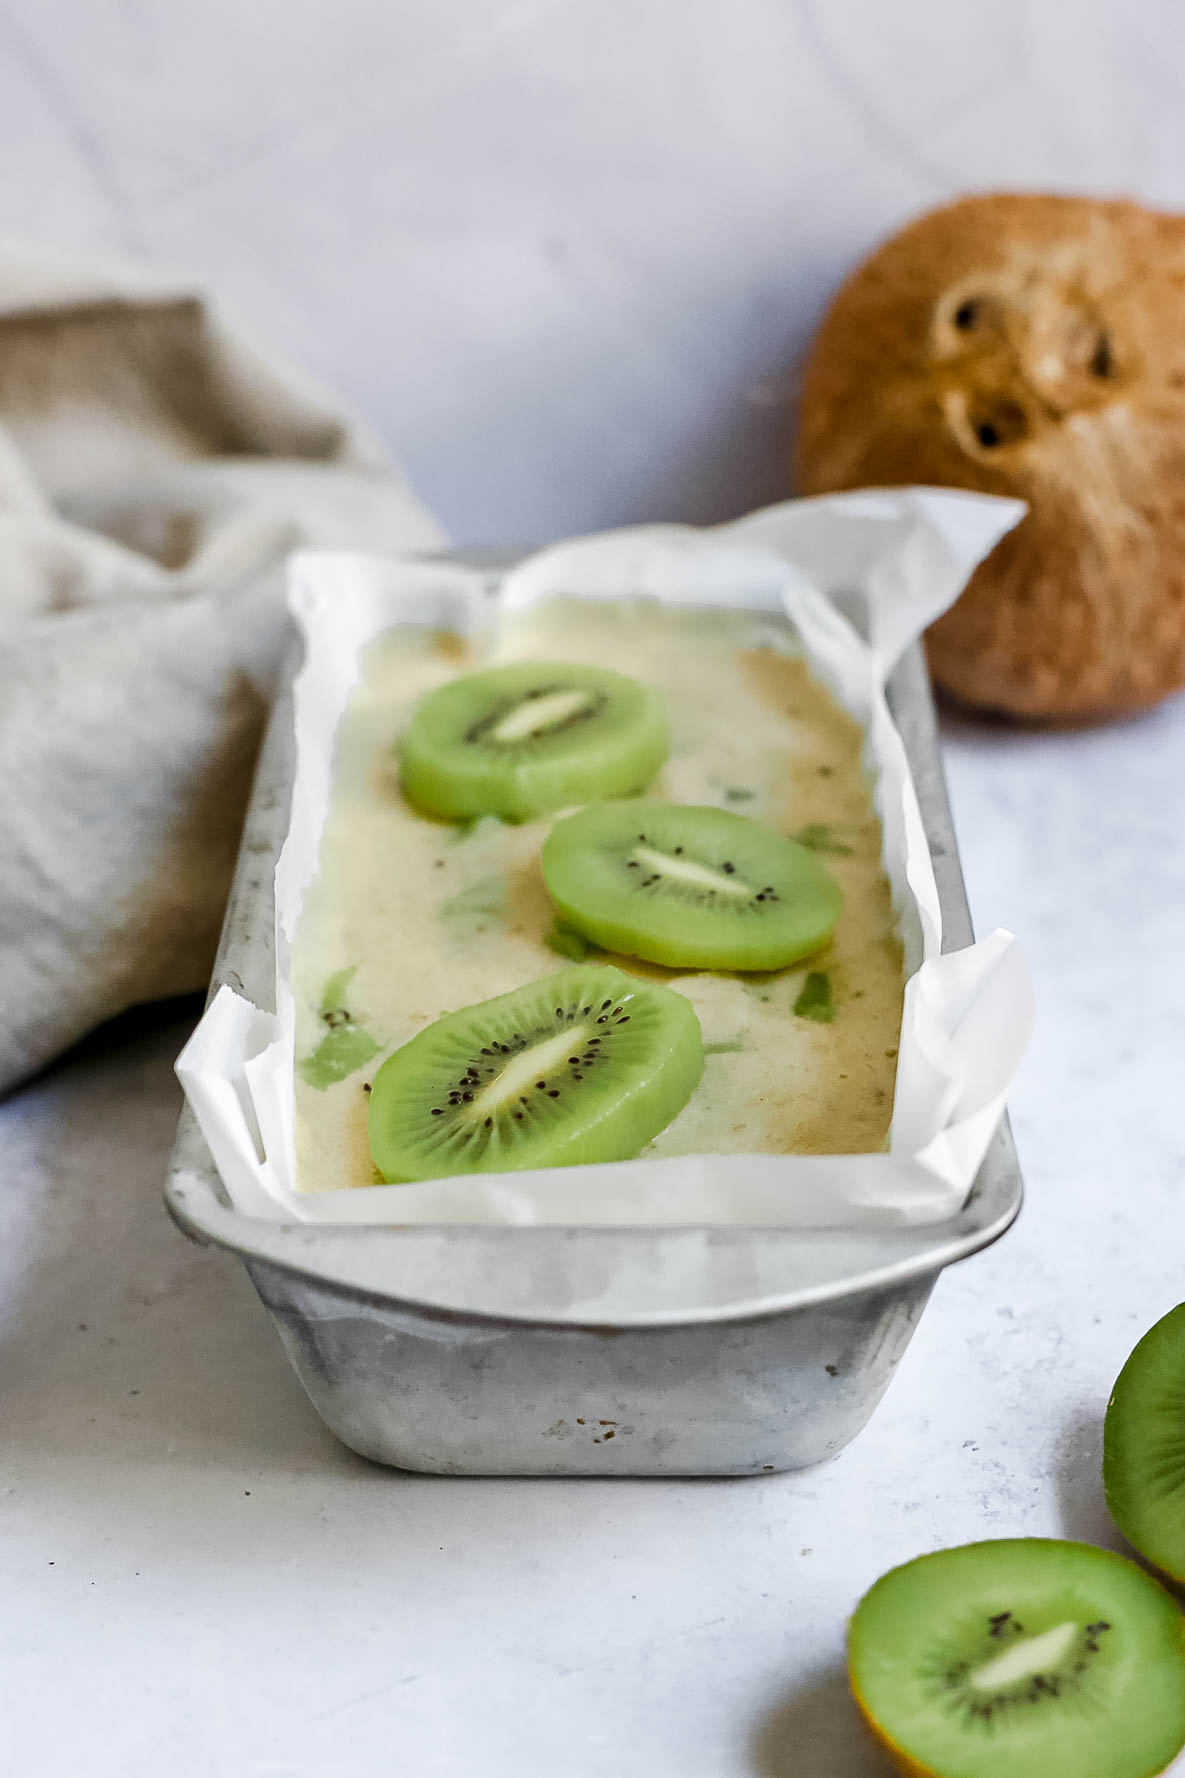 Kiwis and Cream Ice Cream